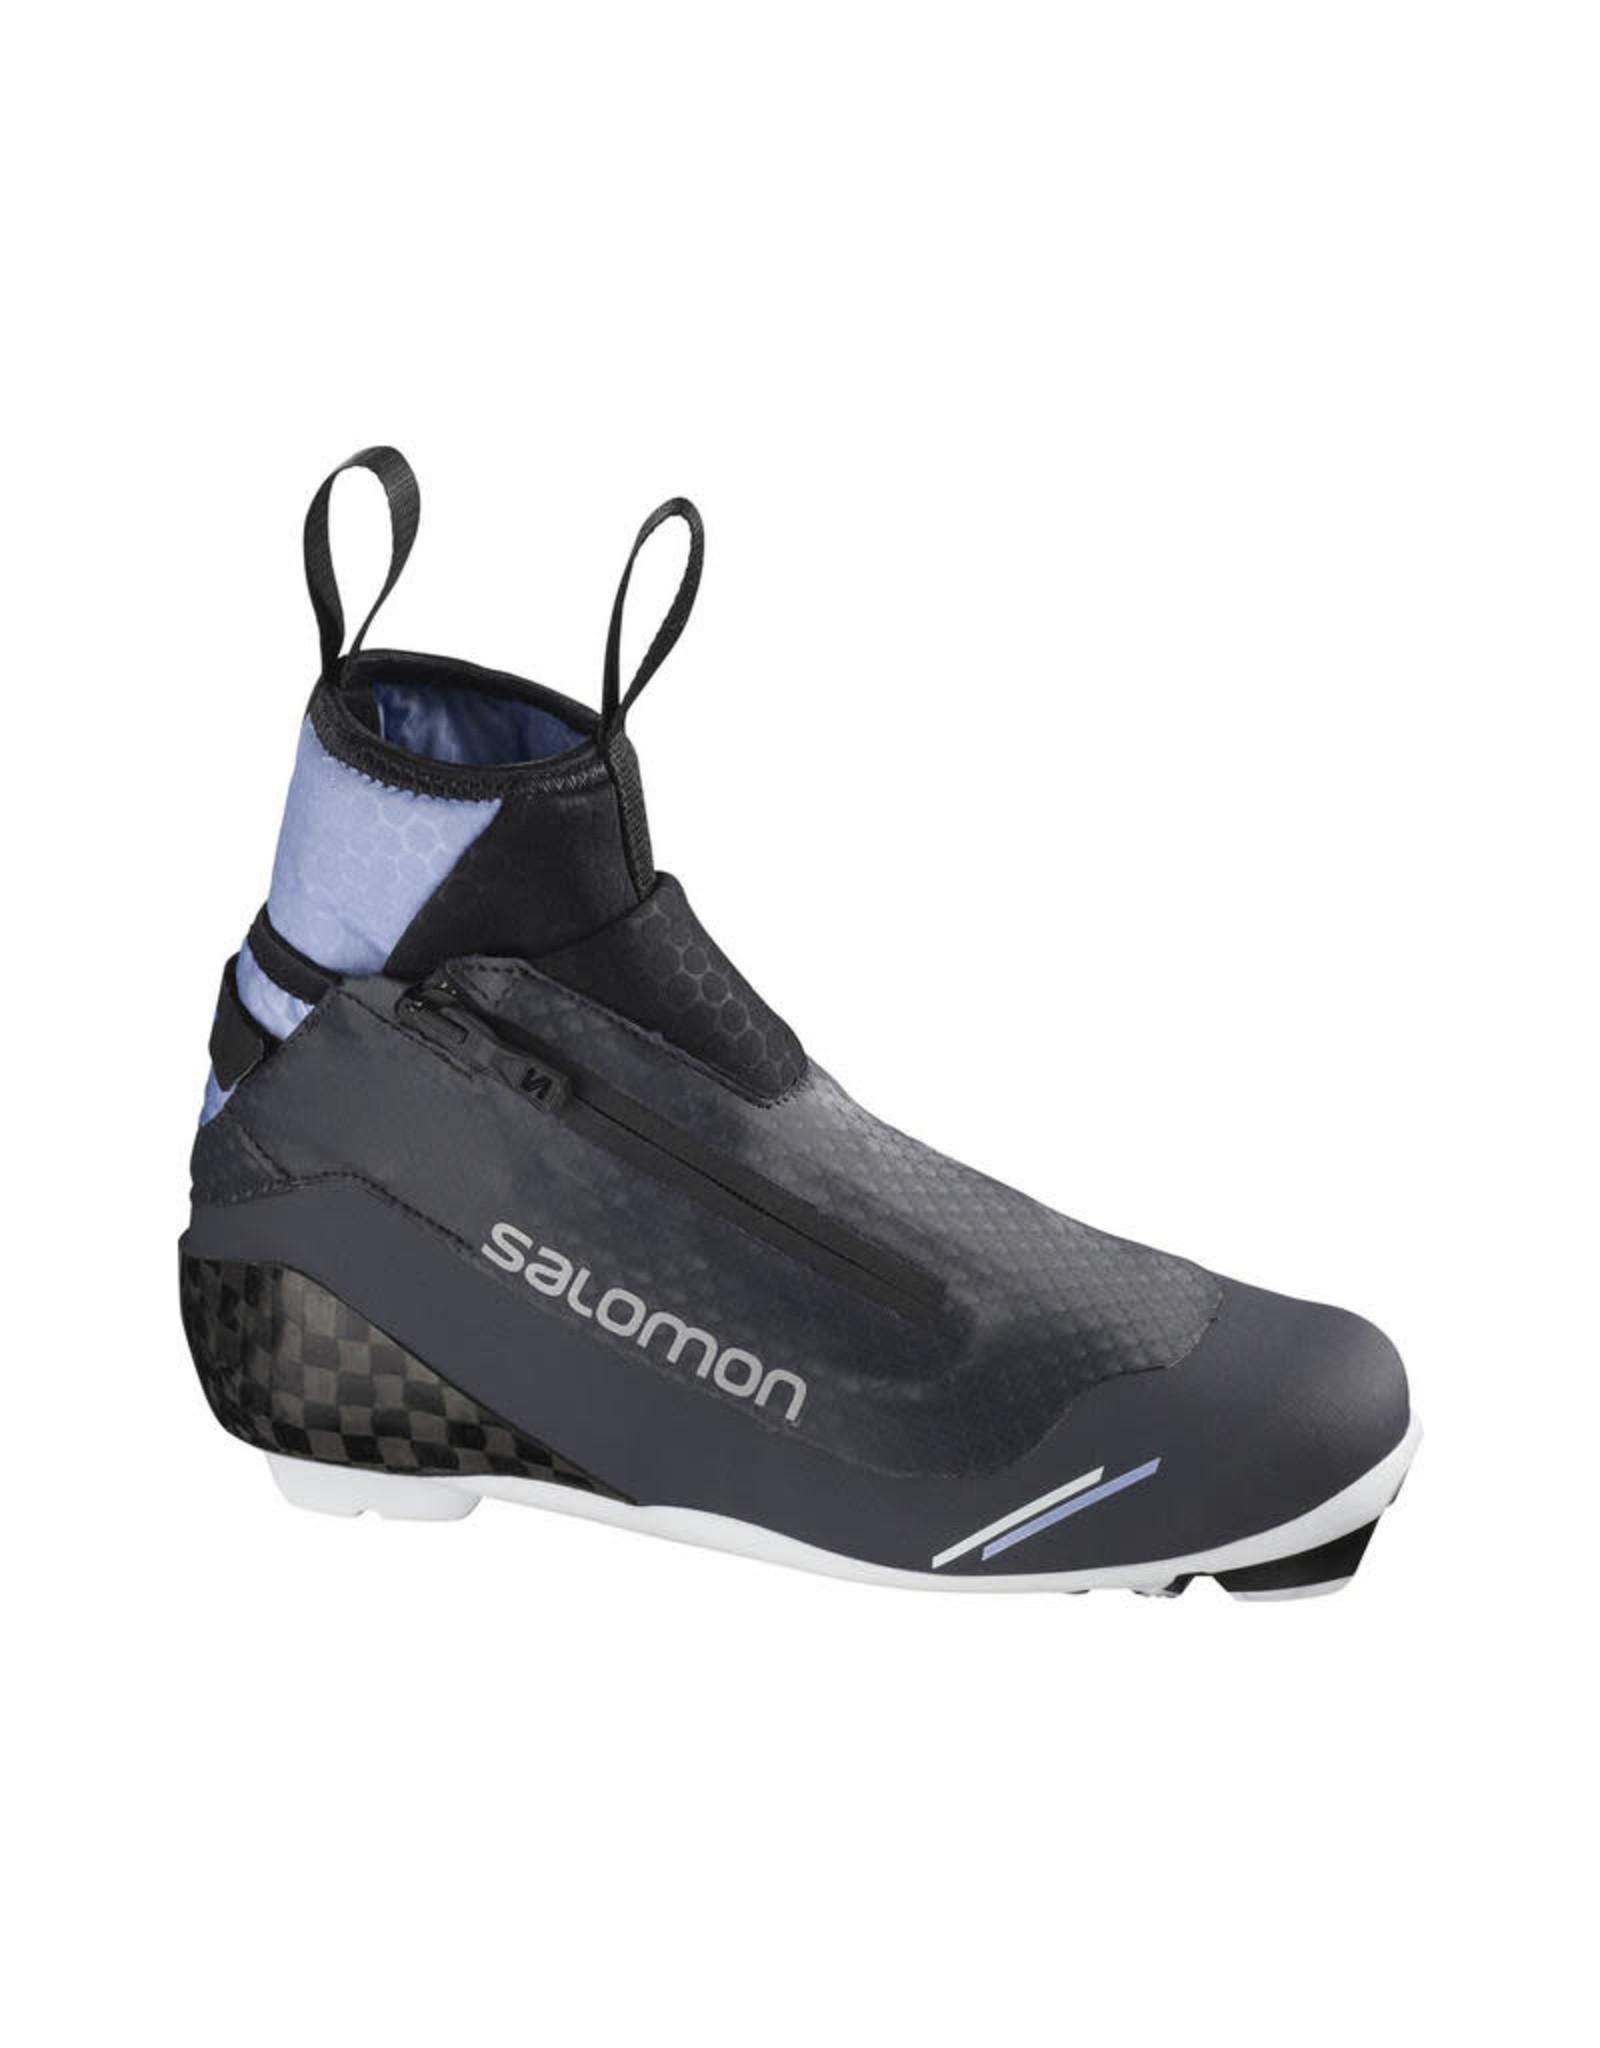 SALOMON '21, Salomon, Boot, S/Race Vitane Classic Prolink